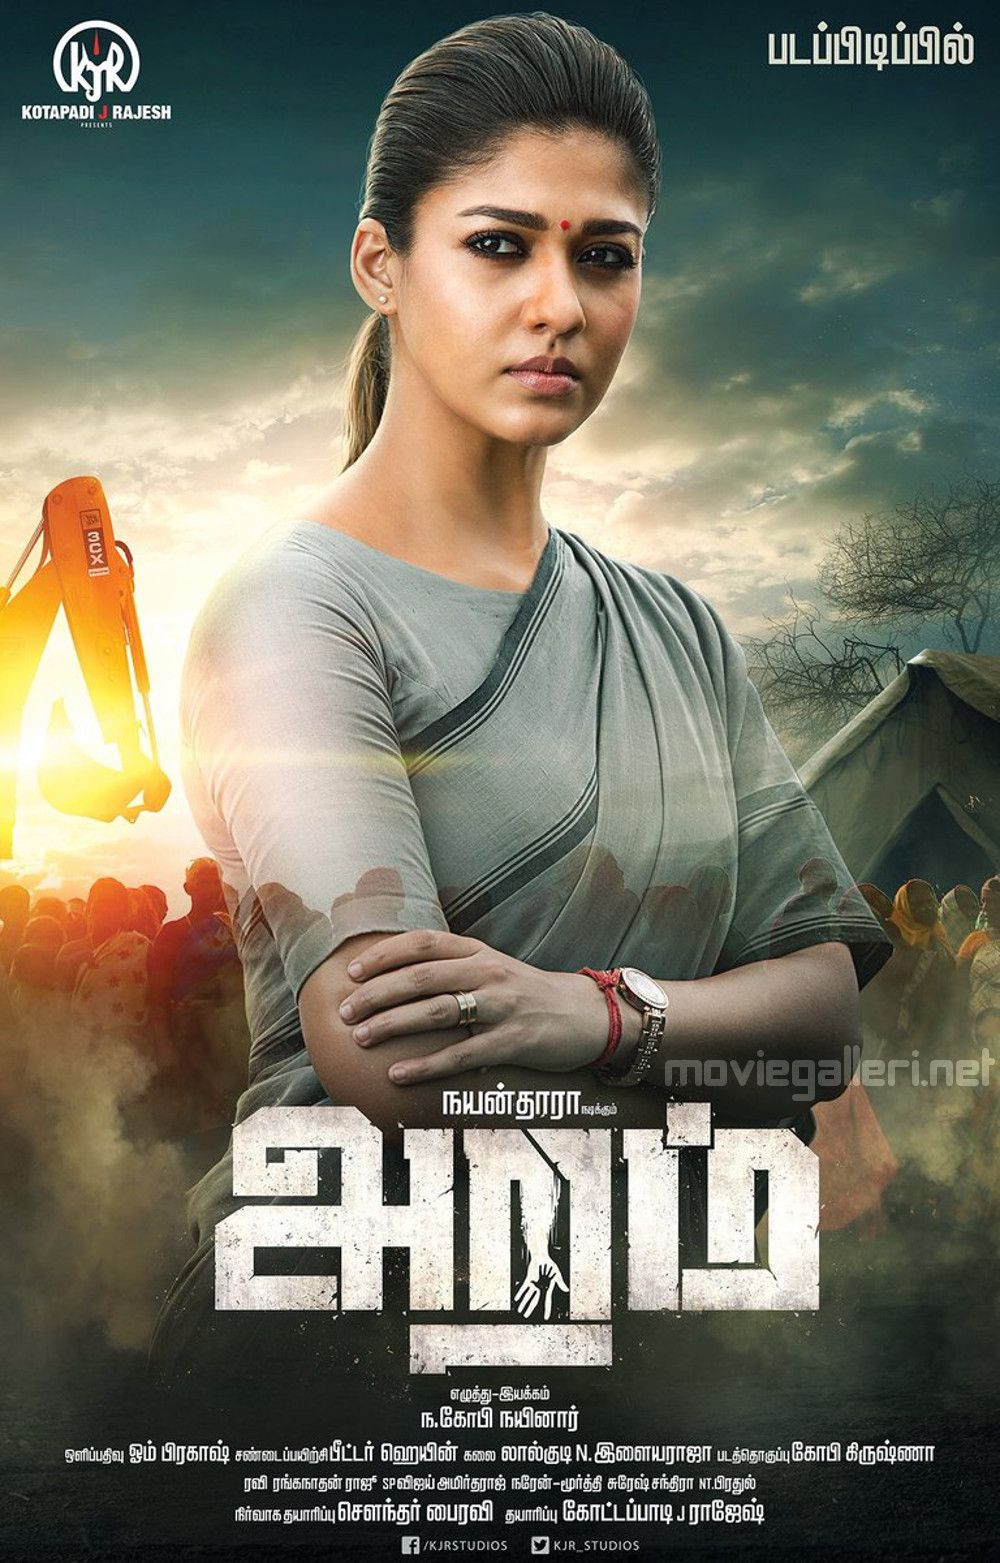 Ajith Telugu Movies Names